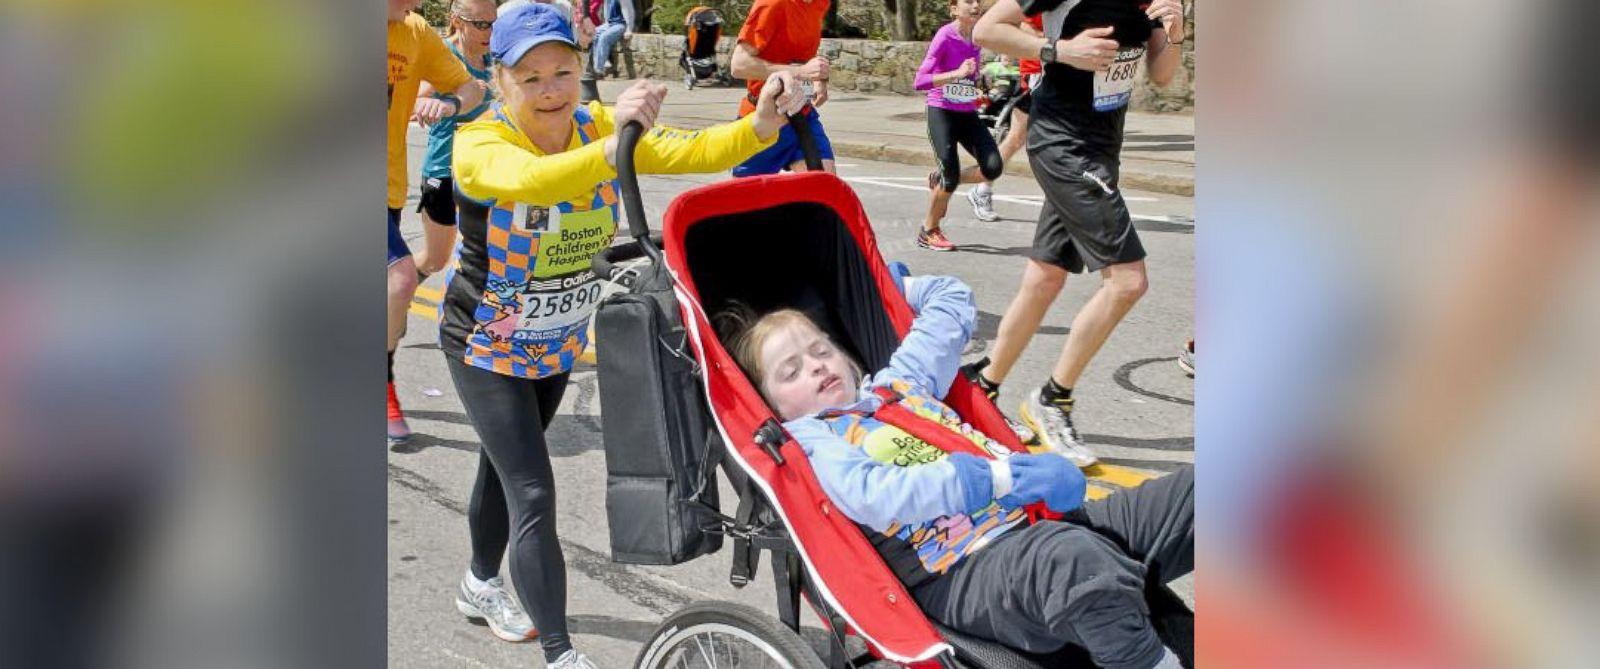 PHOTO: Kristine and Kayla Biagiotti were on their first Boston Marathon together last year.